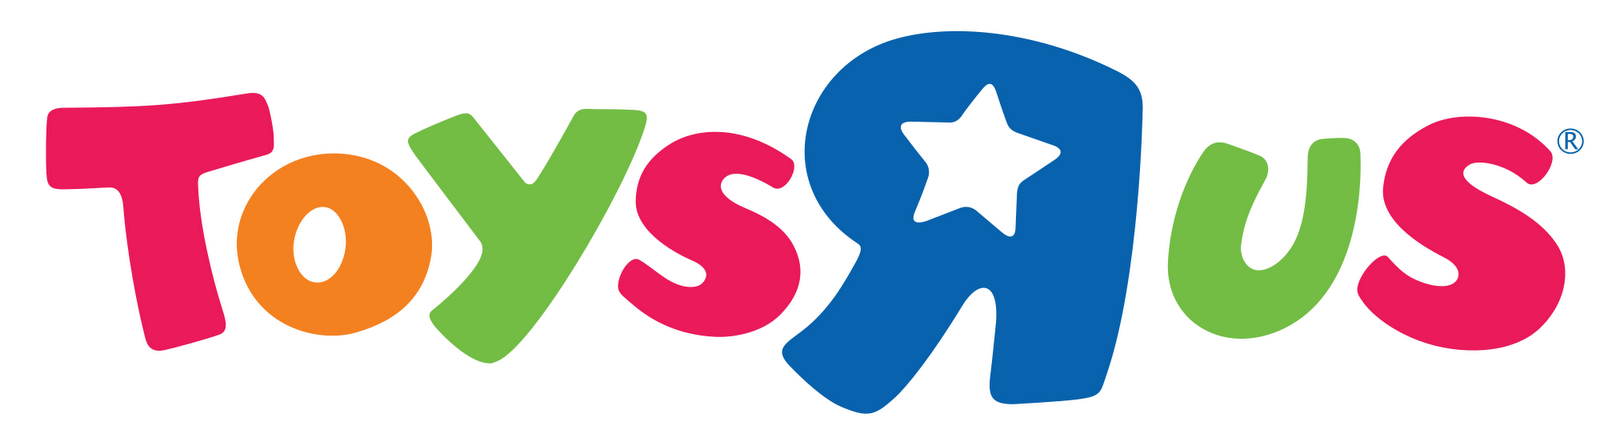 Comprar Toys R Us Online